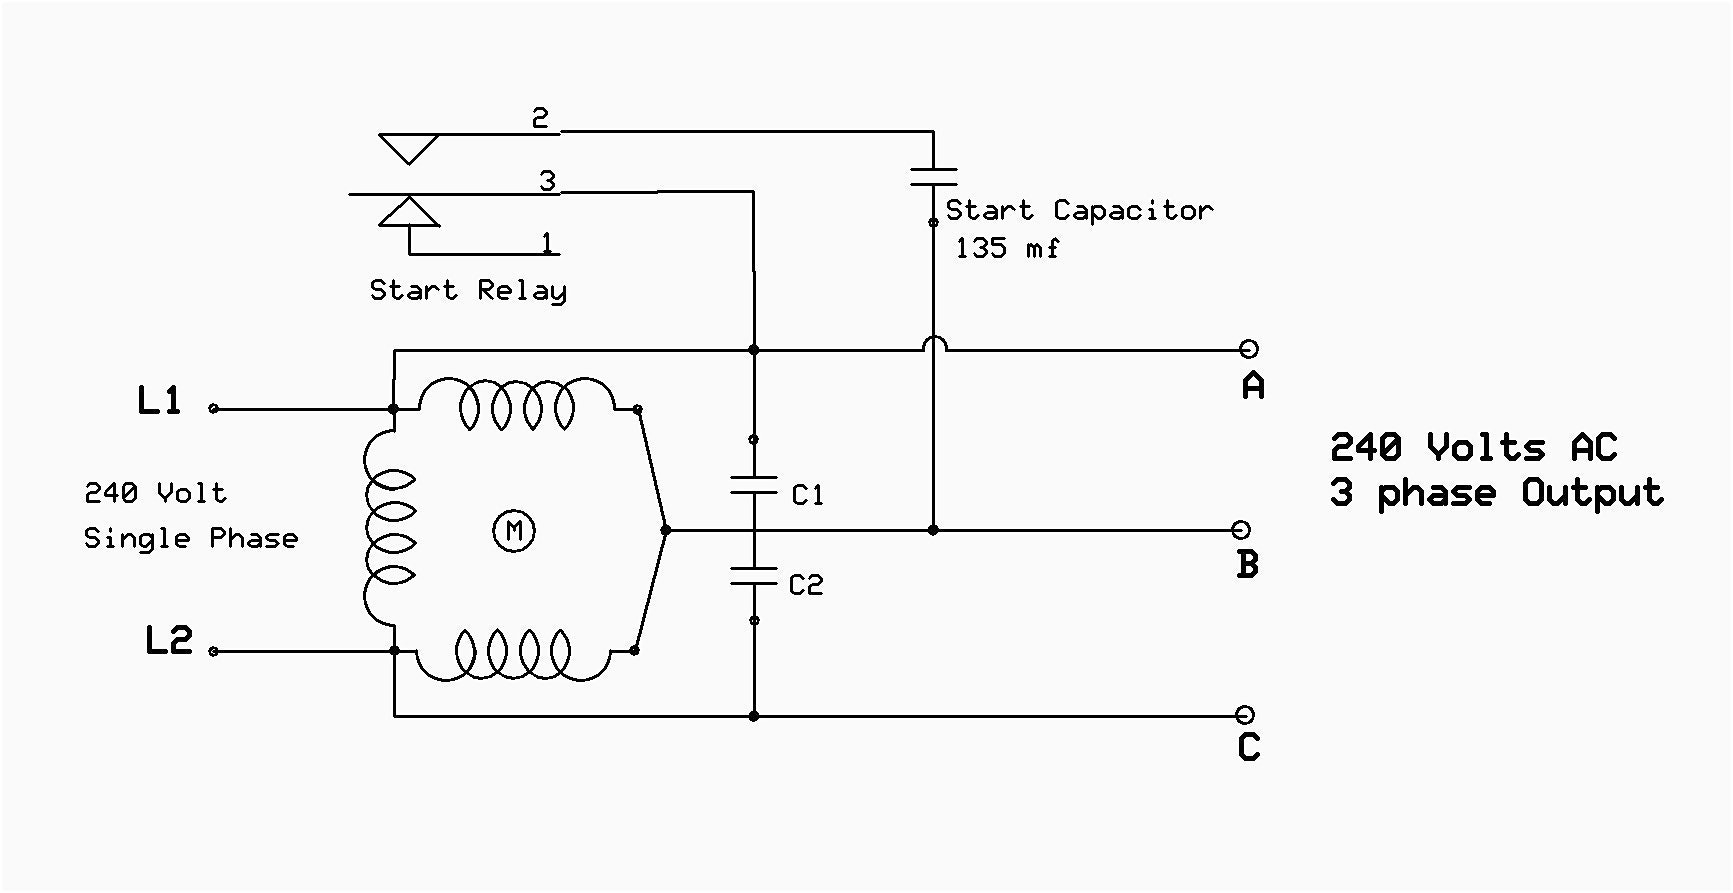 wiring 3 phase motor 240 volts wiring diagram basic 240 volt phase diagram data diagram schematicwiring 3 phase motor 240 volts 5